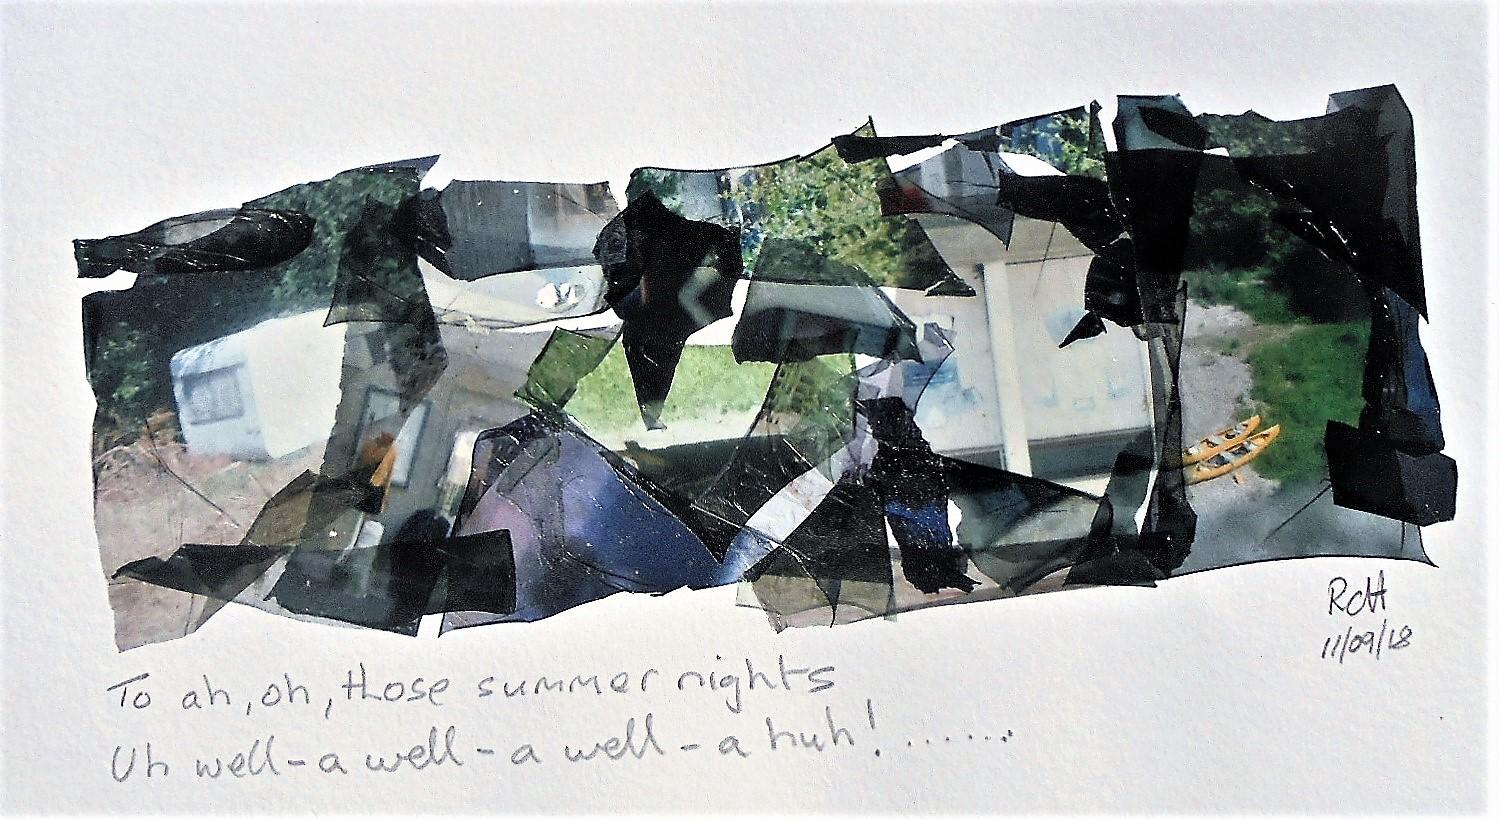 Summer Nights | Polaroid Land 100 | Fuji FP100C Emulsion Lift Collage | Robert Campbell Henderson